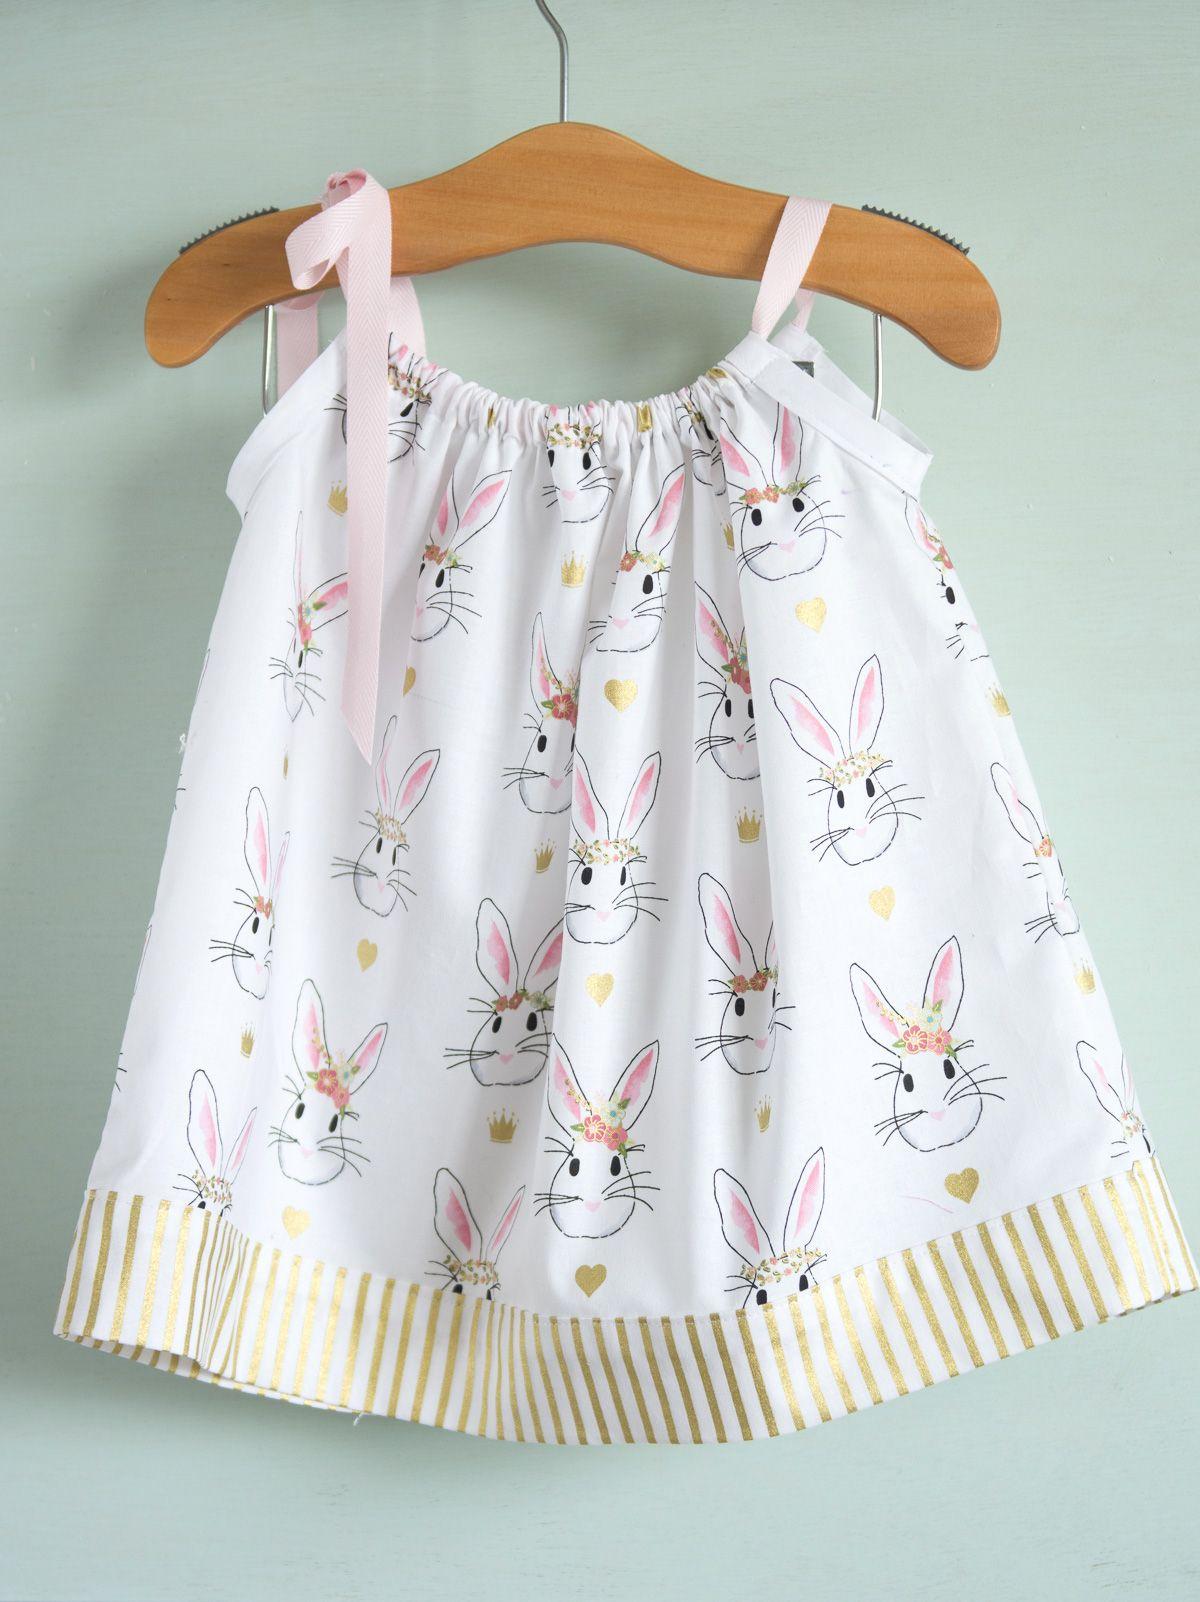 Pillowcase Dress Tutorial | To Sew- Girls | Pinterest | Costura ...